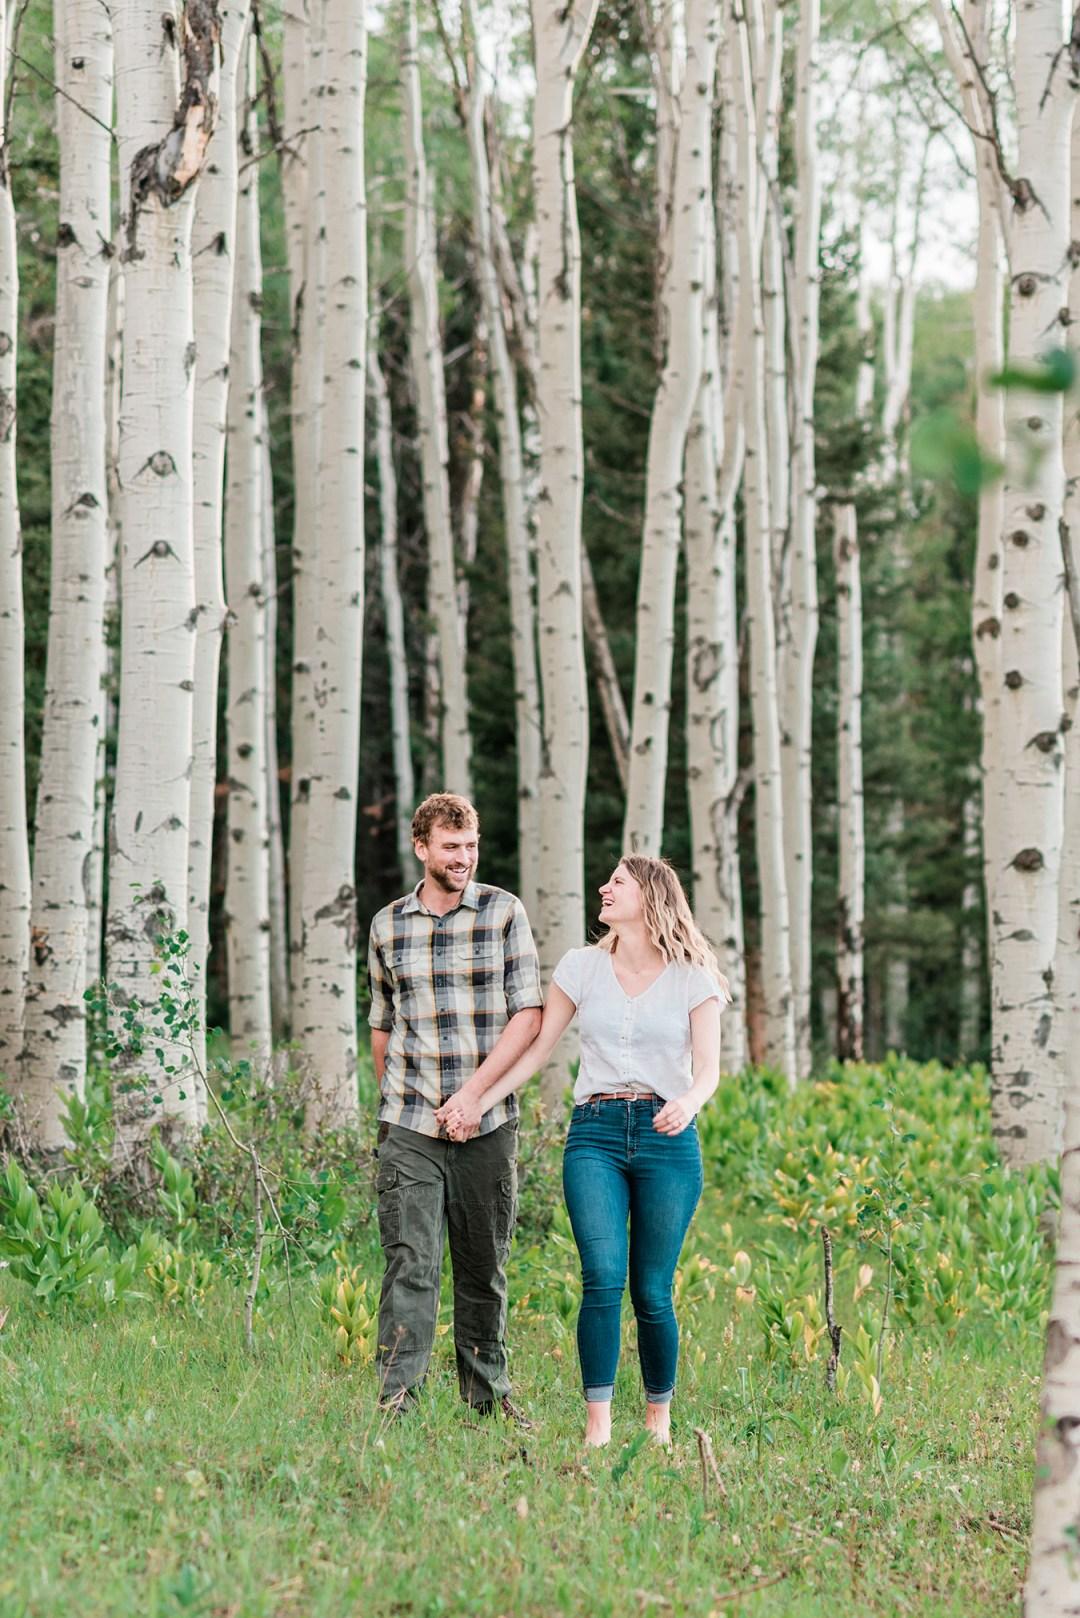 Annie & Taylorwalk through an Aspen glen for their Glenwood Springs Engagement Photos